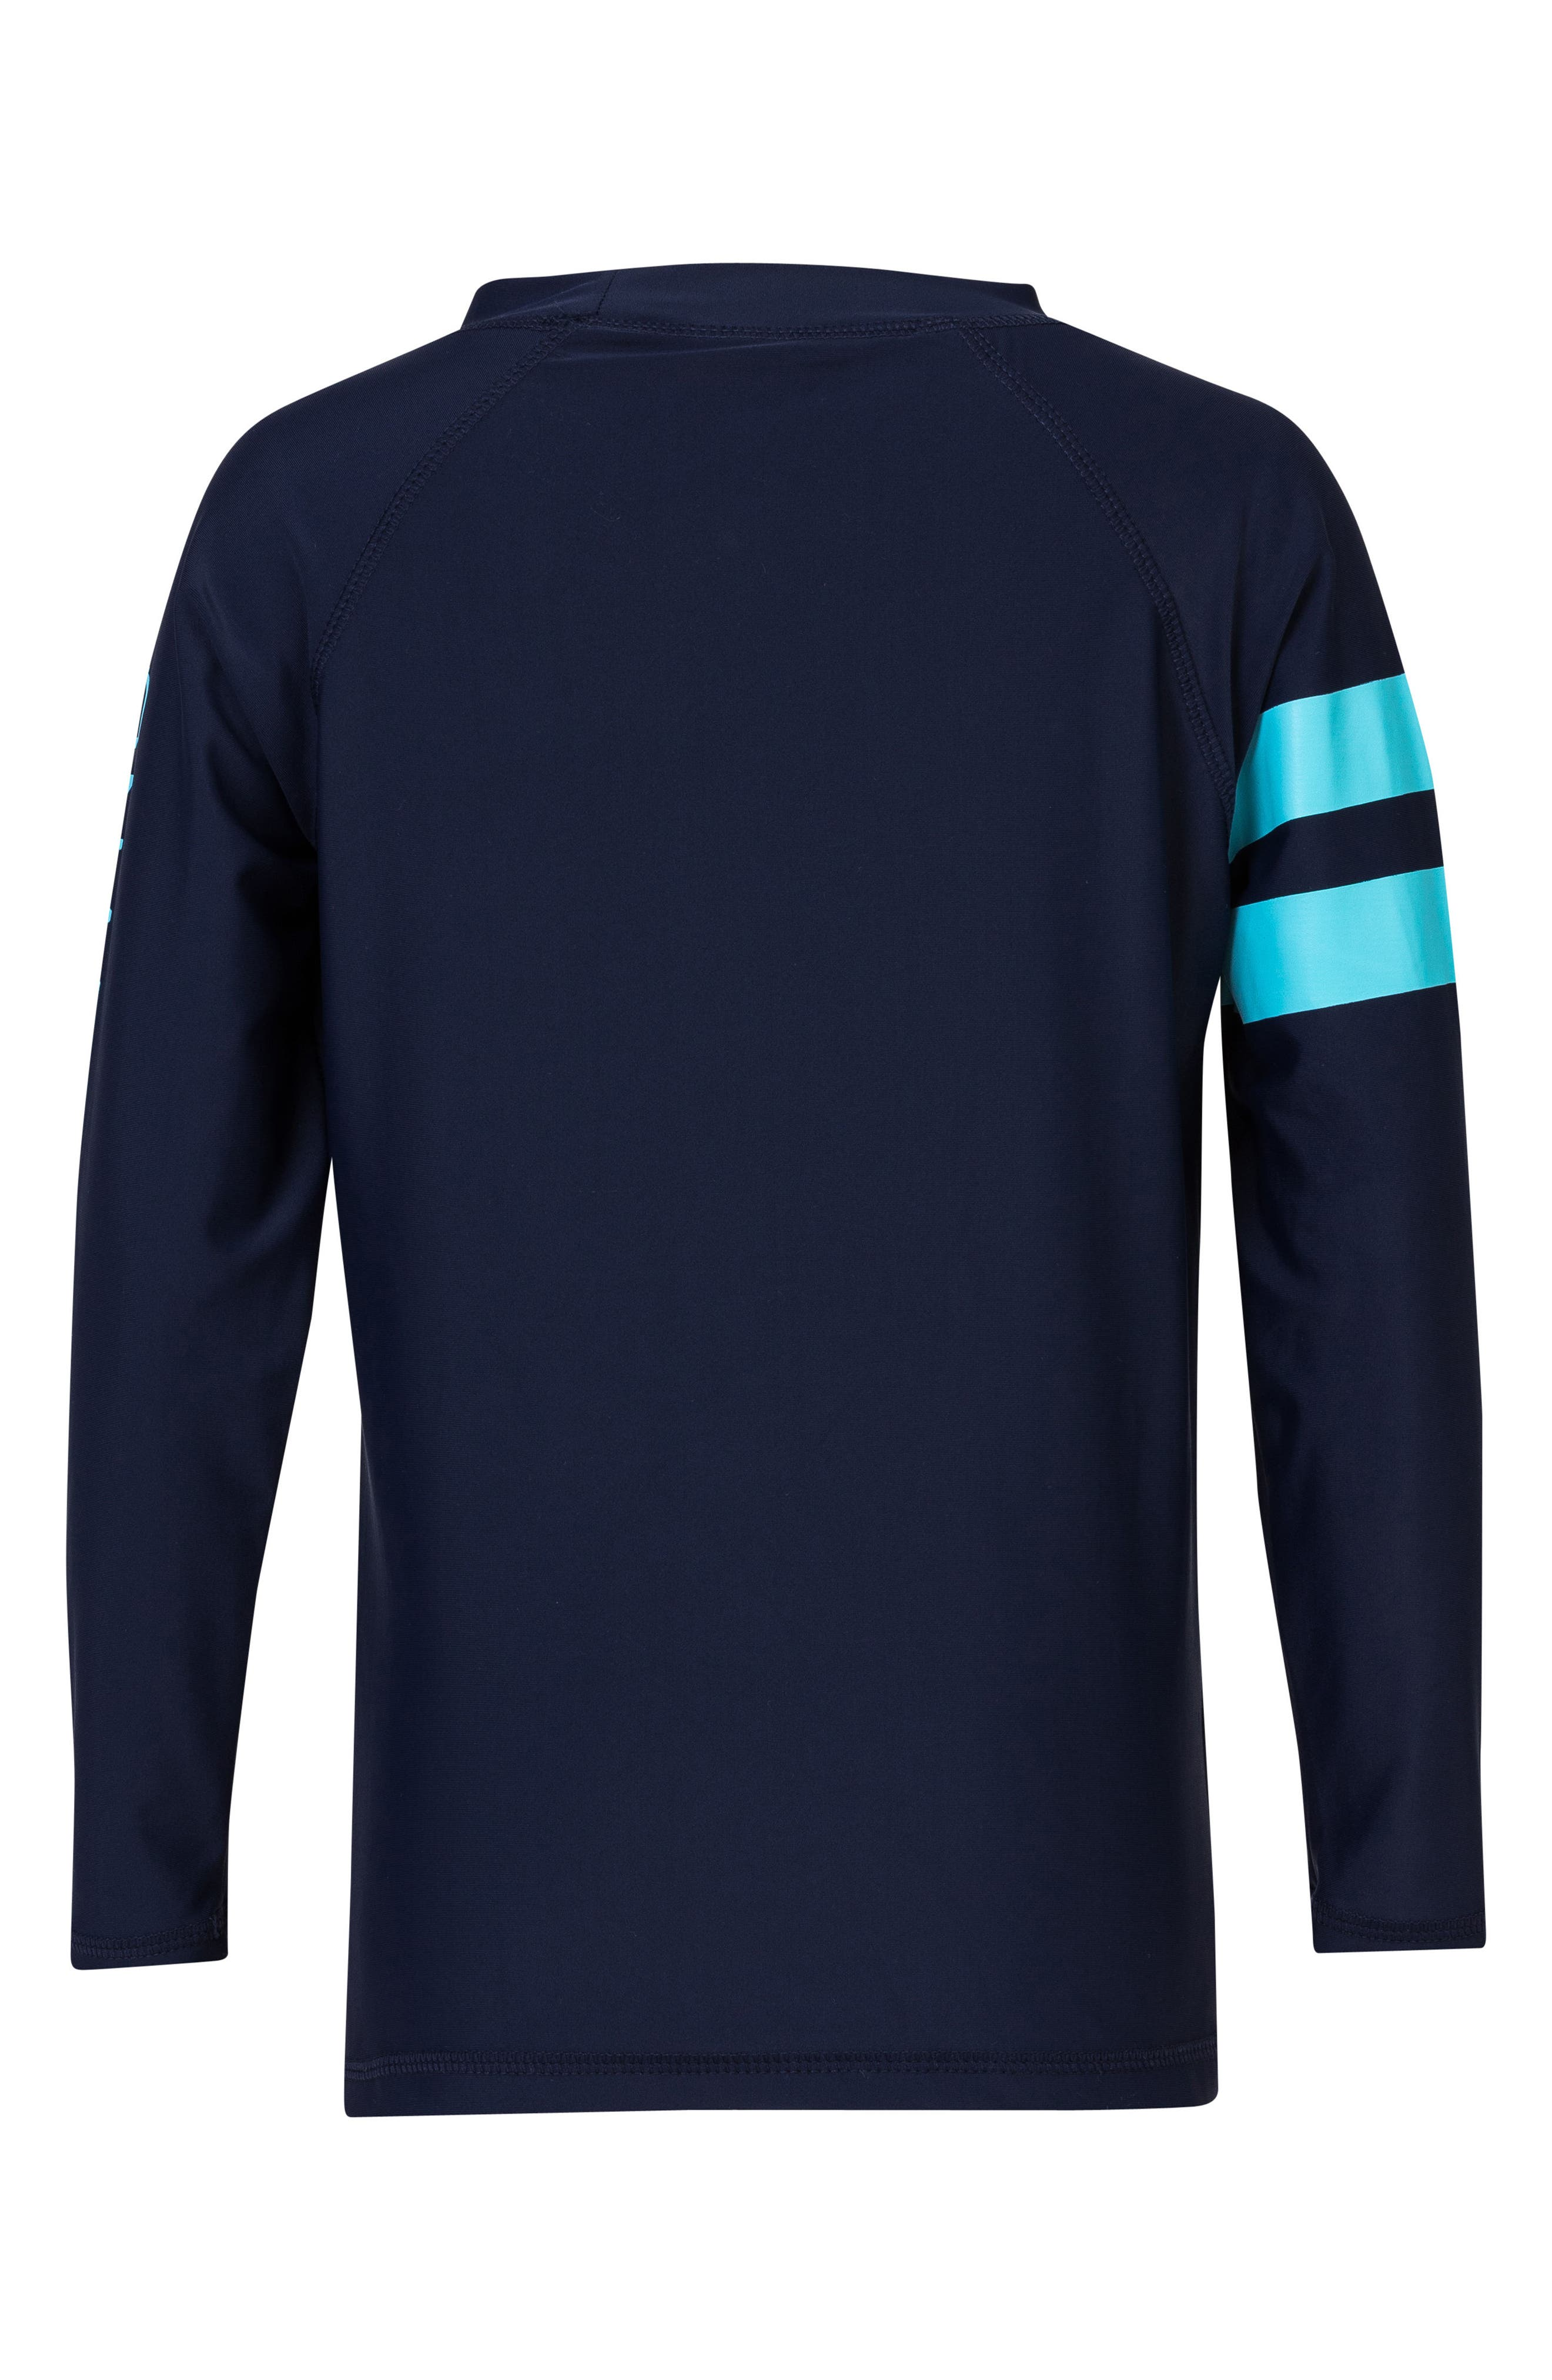 Raglan Long Sleeve Rashguard,                             Alternate thumbnail 2, color,                             Navy/ Light Blue Stripe